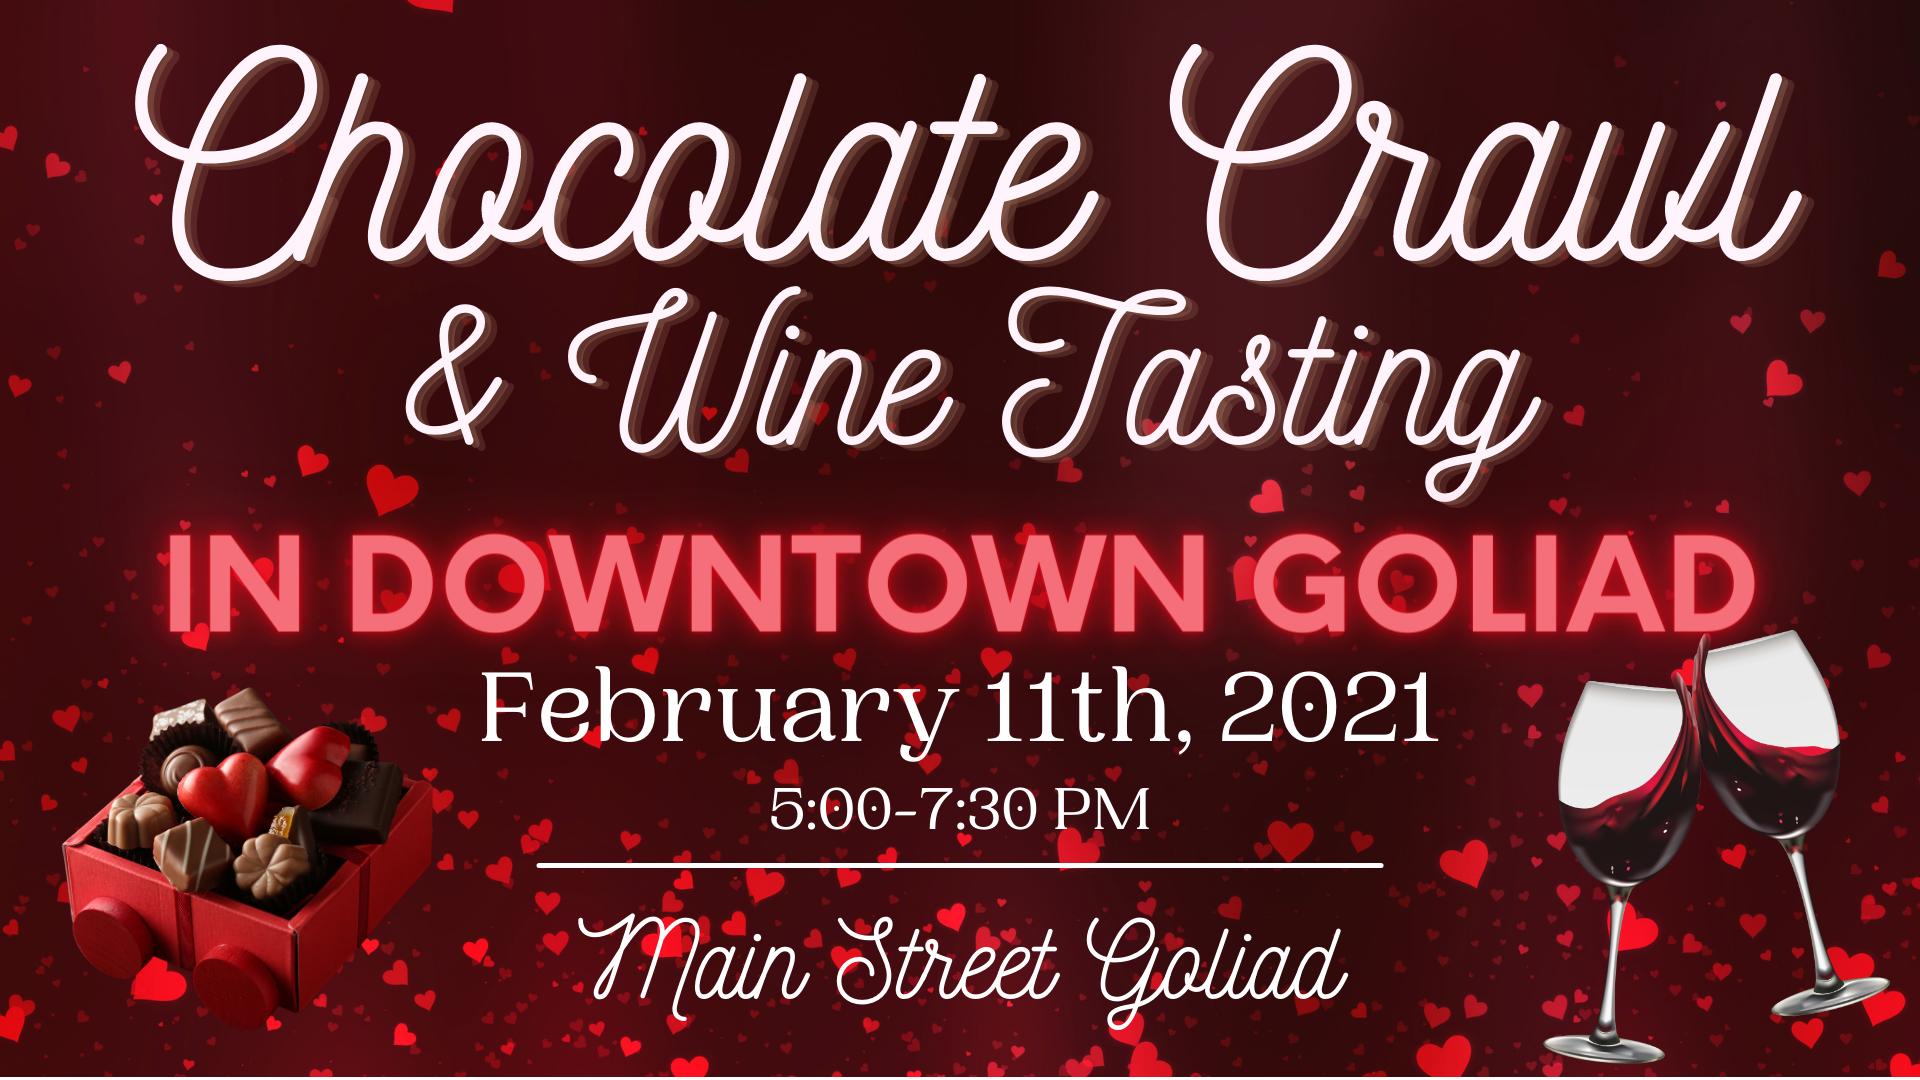 Chocolate Crawl & Wine Tasting Event Cov